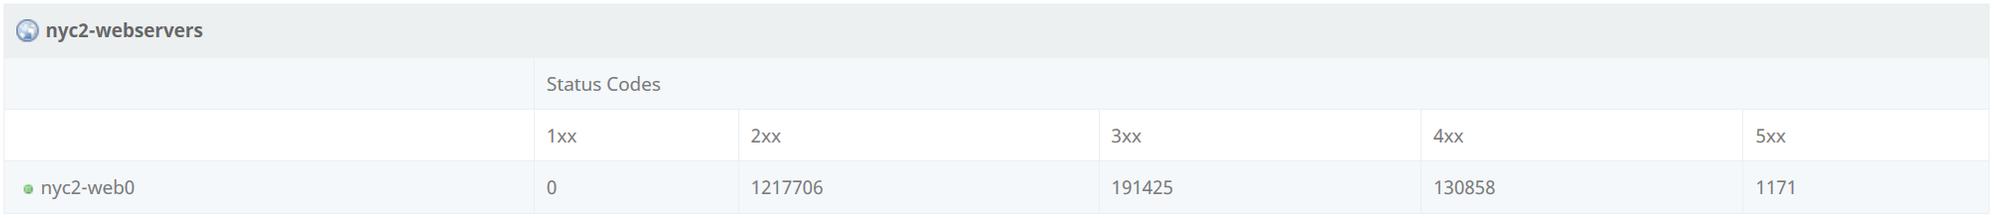 snapt-http-status-codes